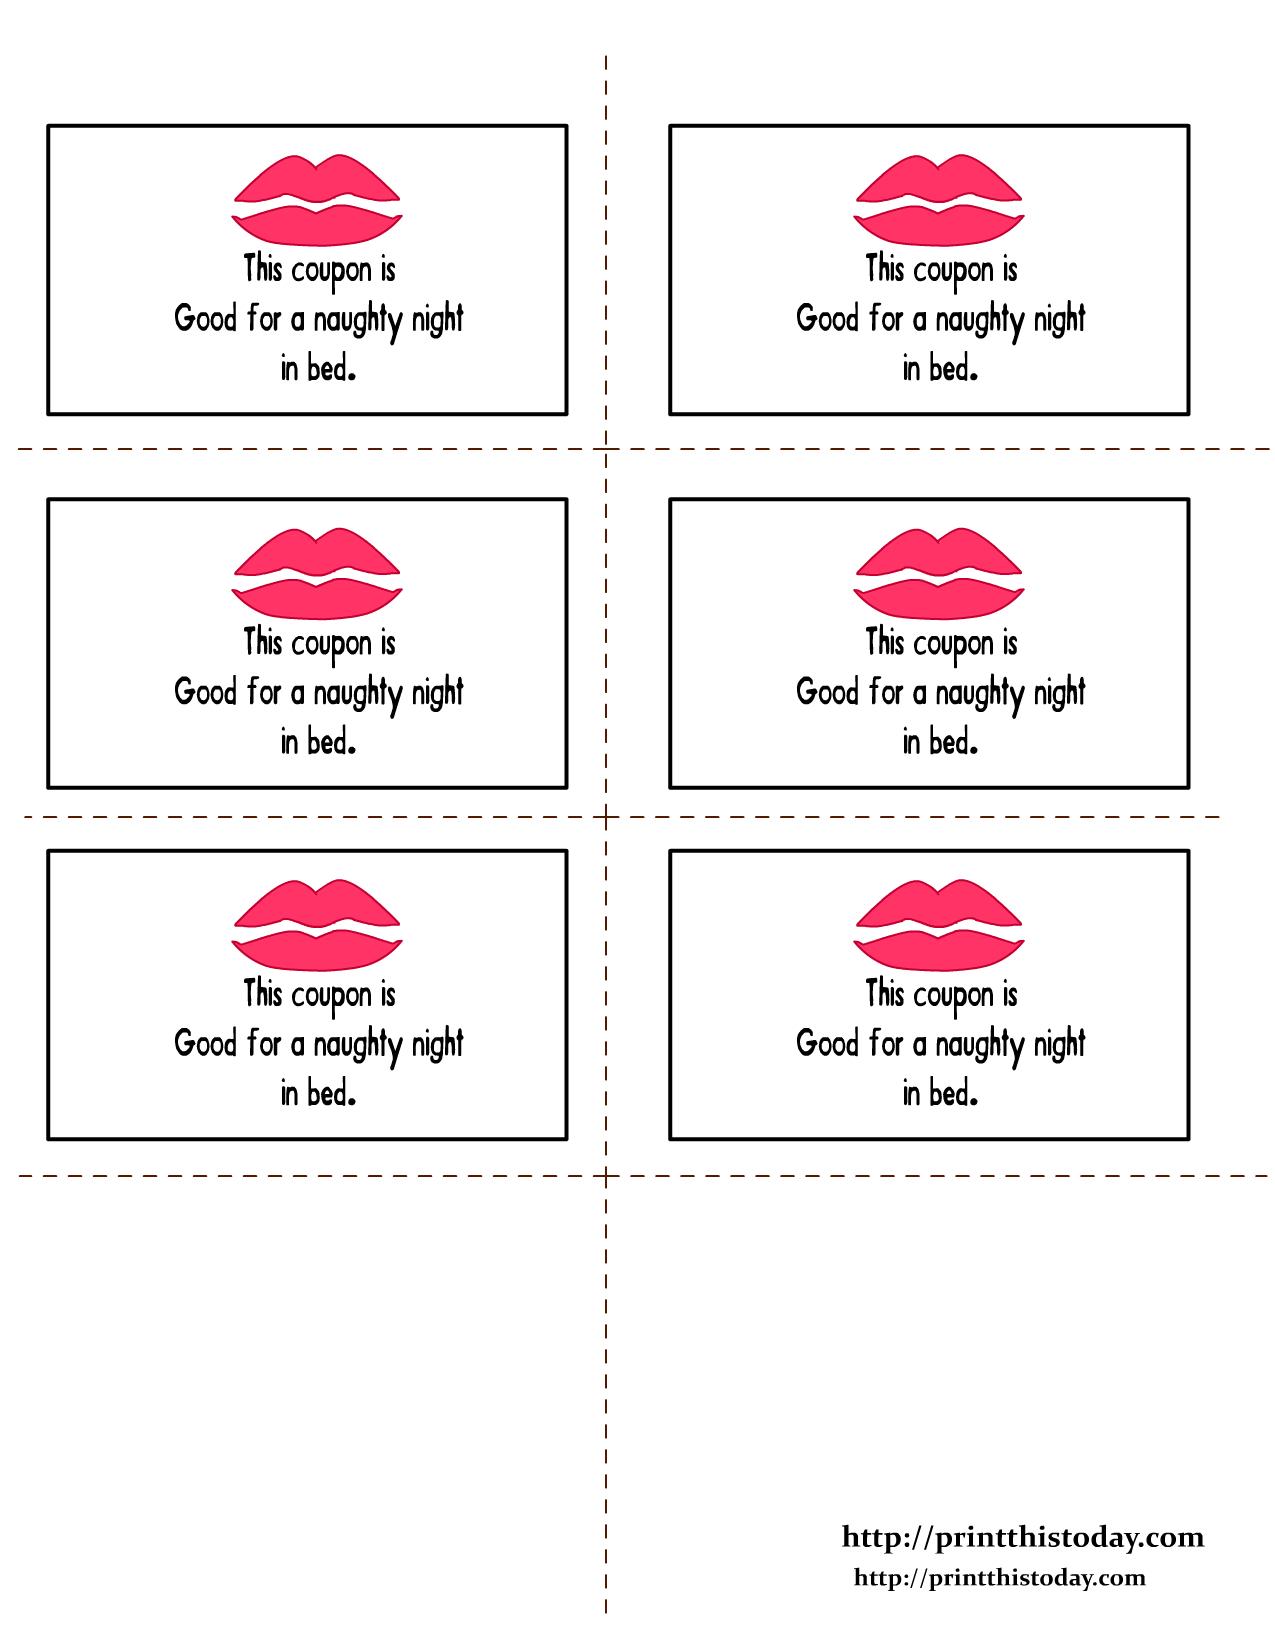 Romantic Love Coupon Printable | Romantic Love Coupons | Print This - Free Printable Coupons For Husband